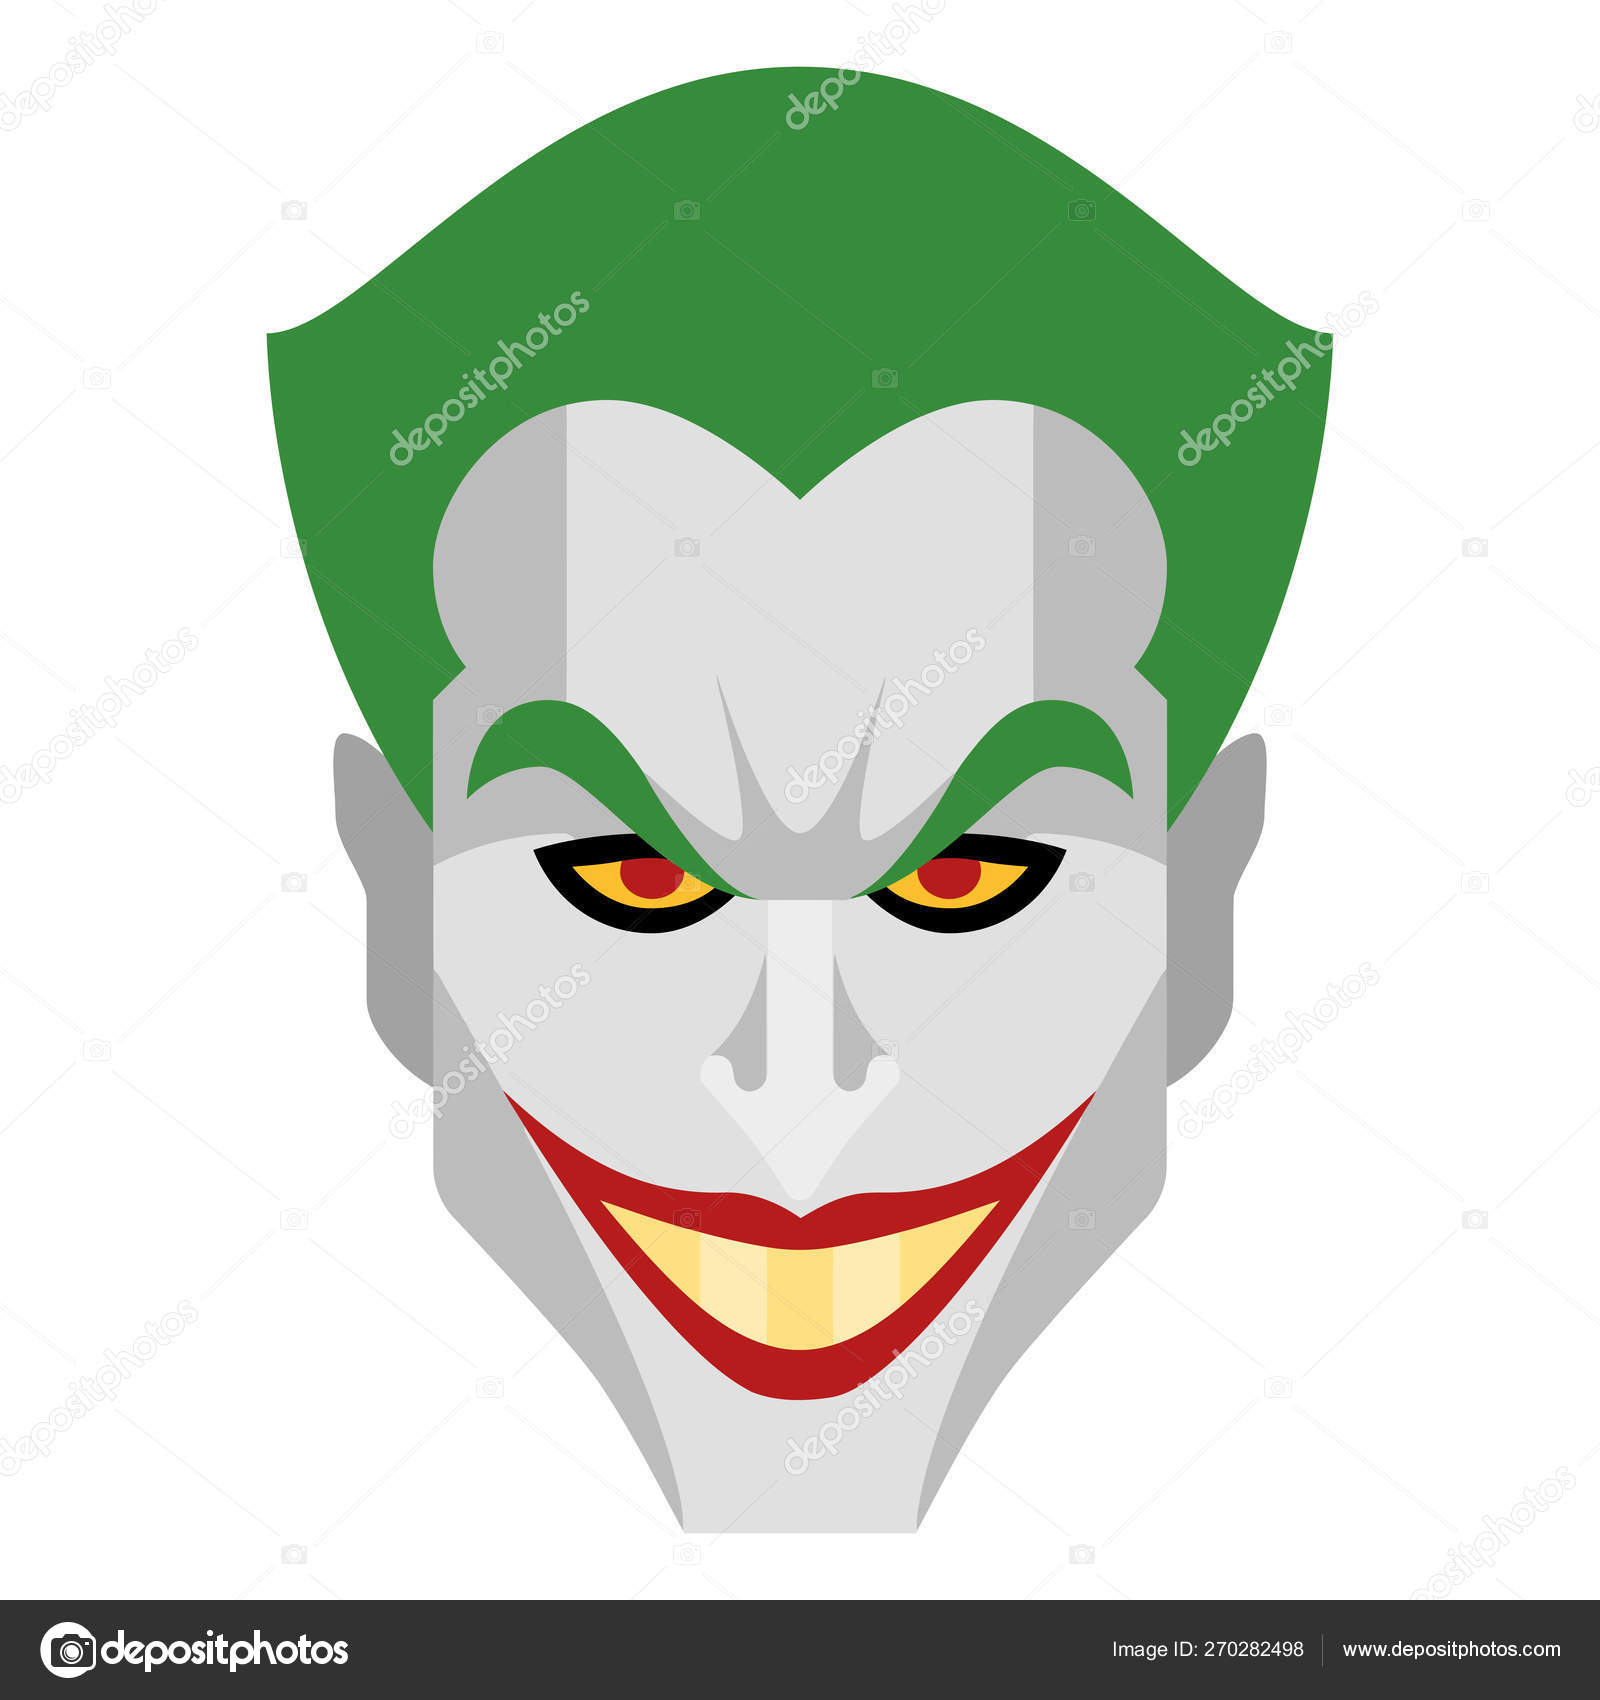 Joker Criminal Villain Illustration Character Cartoon Face